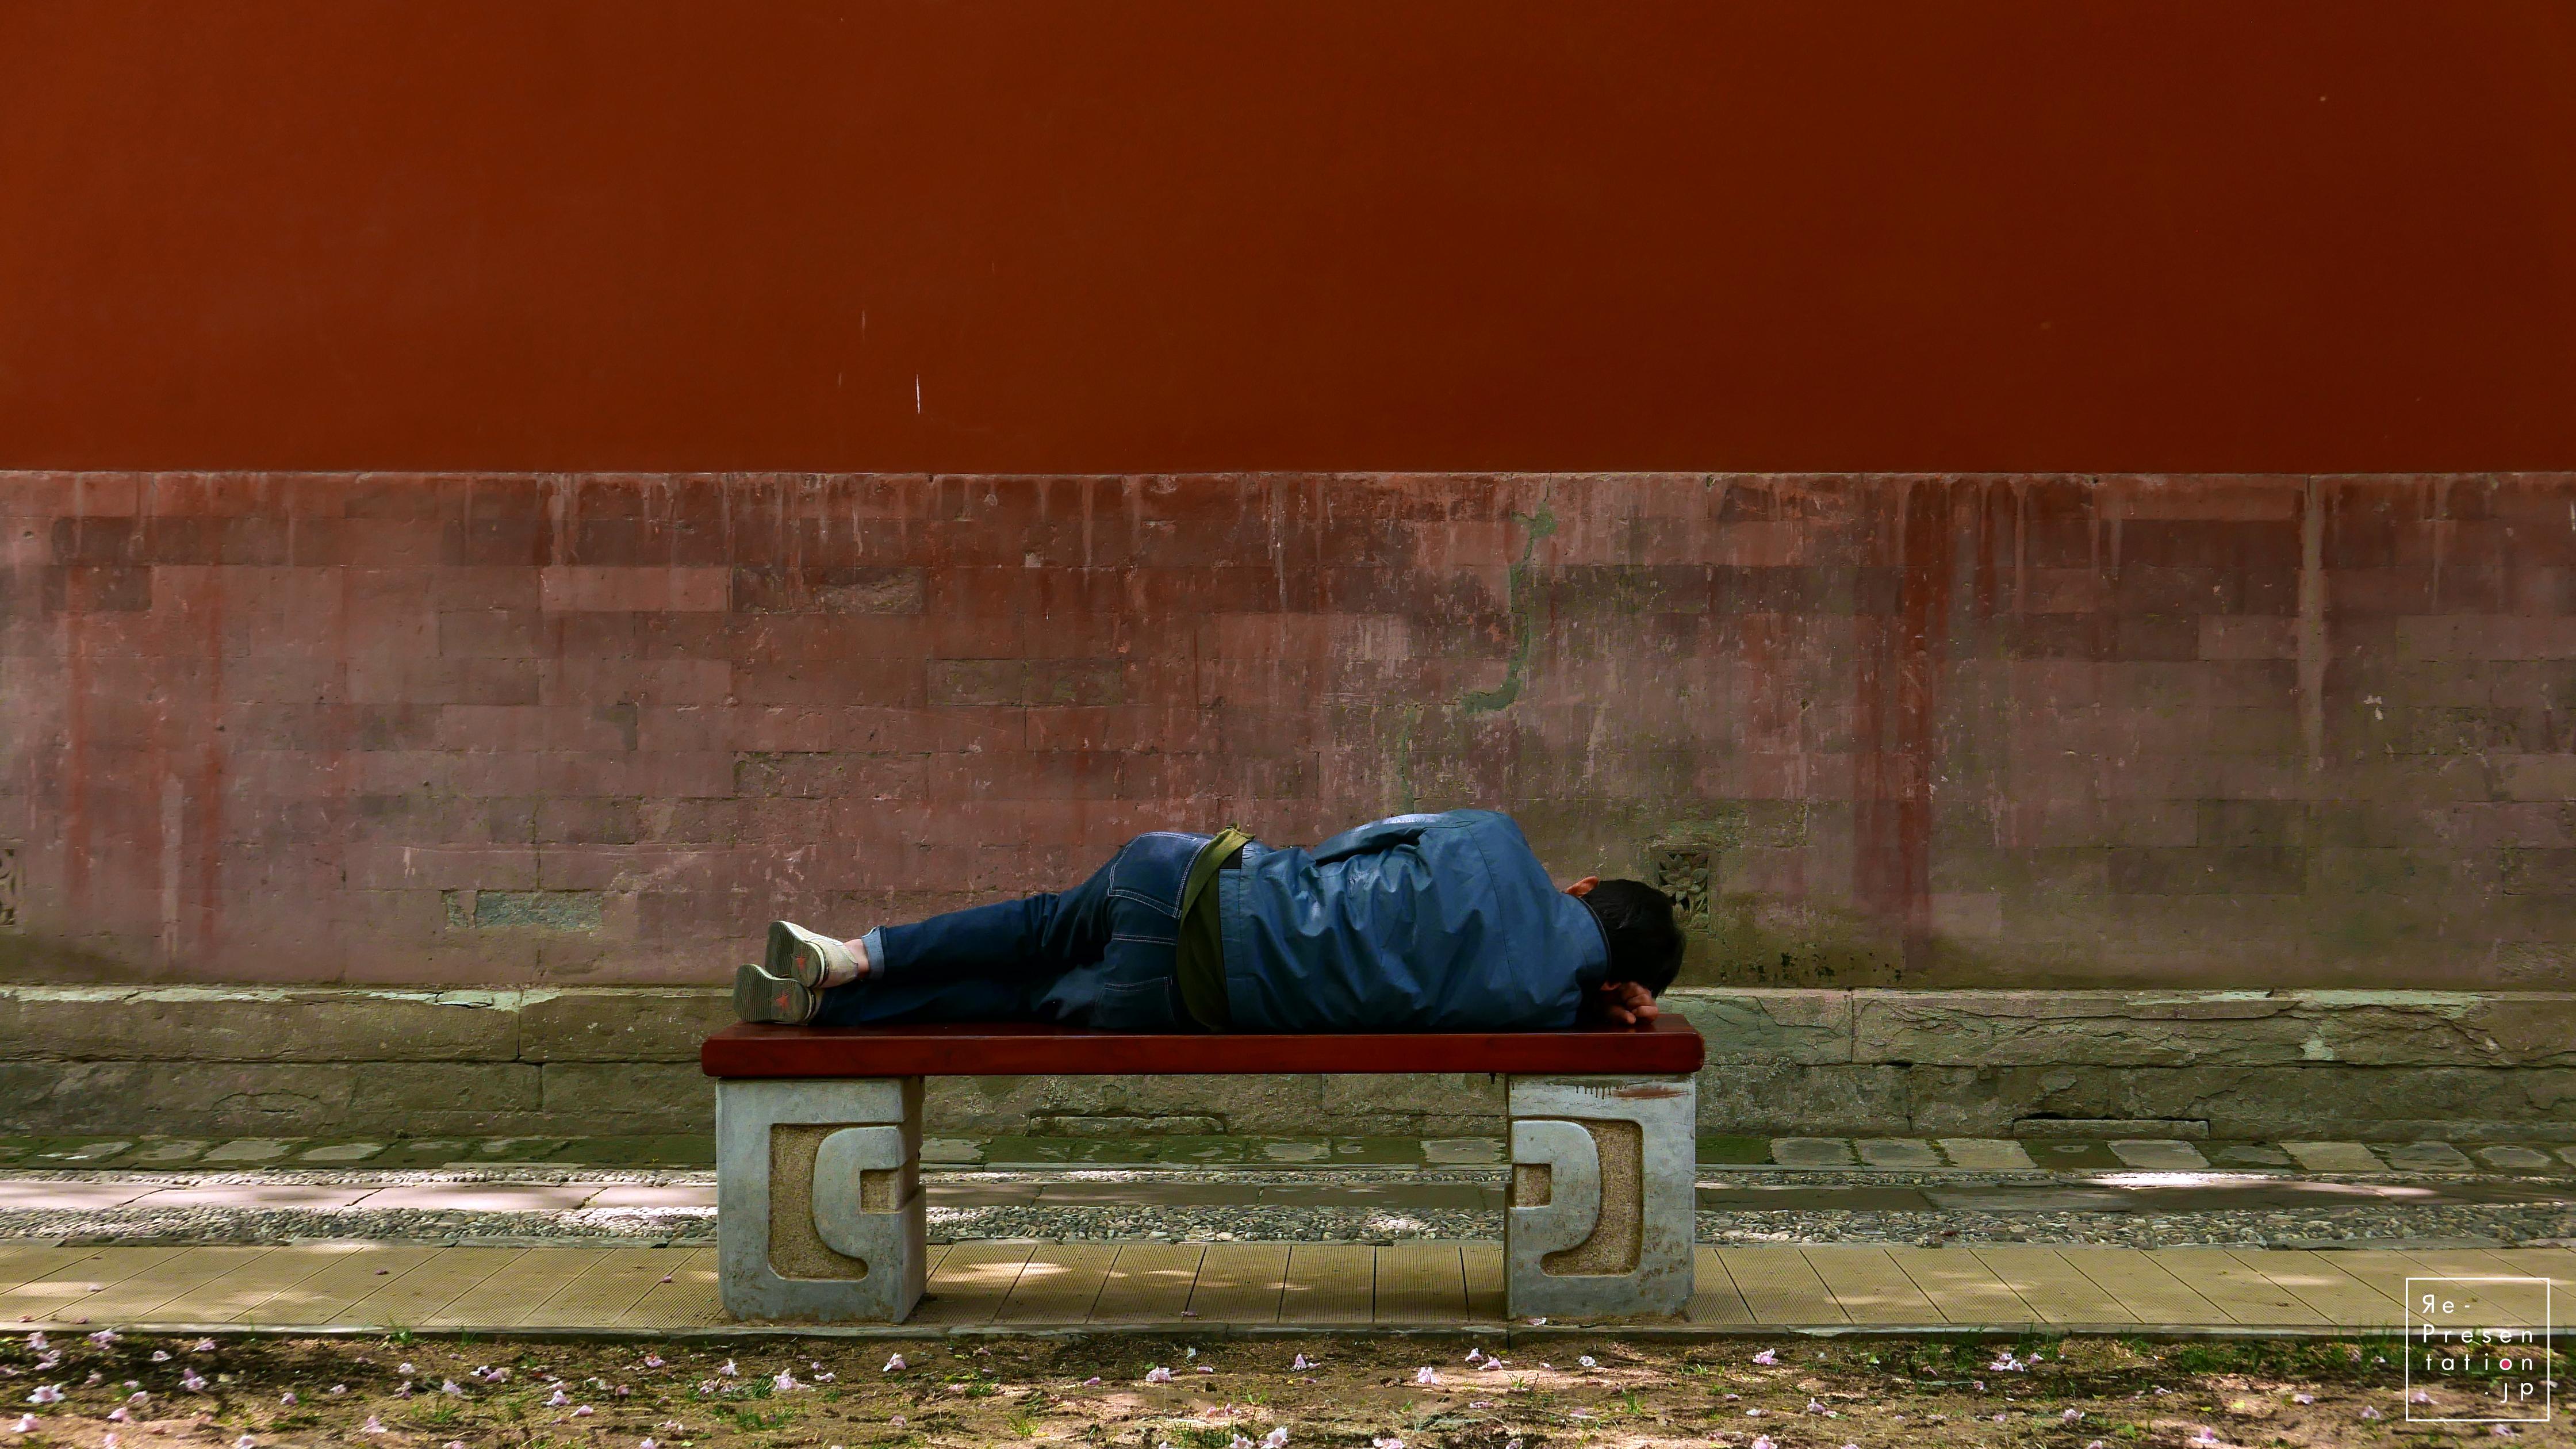 Street photography Masterclass@北京 参加レポート